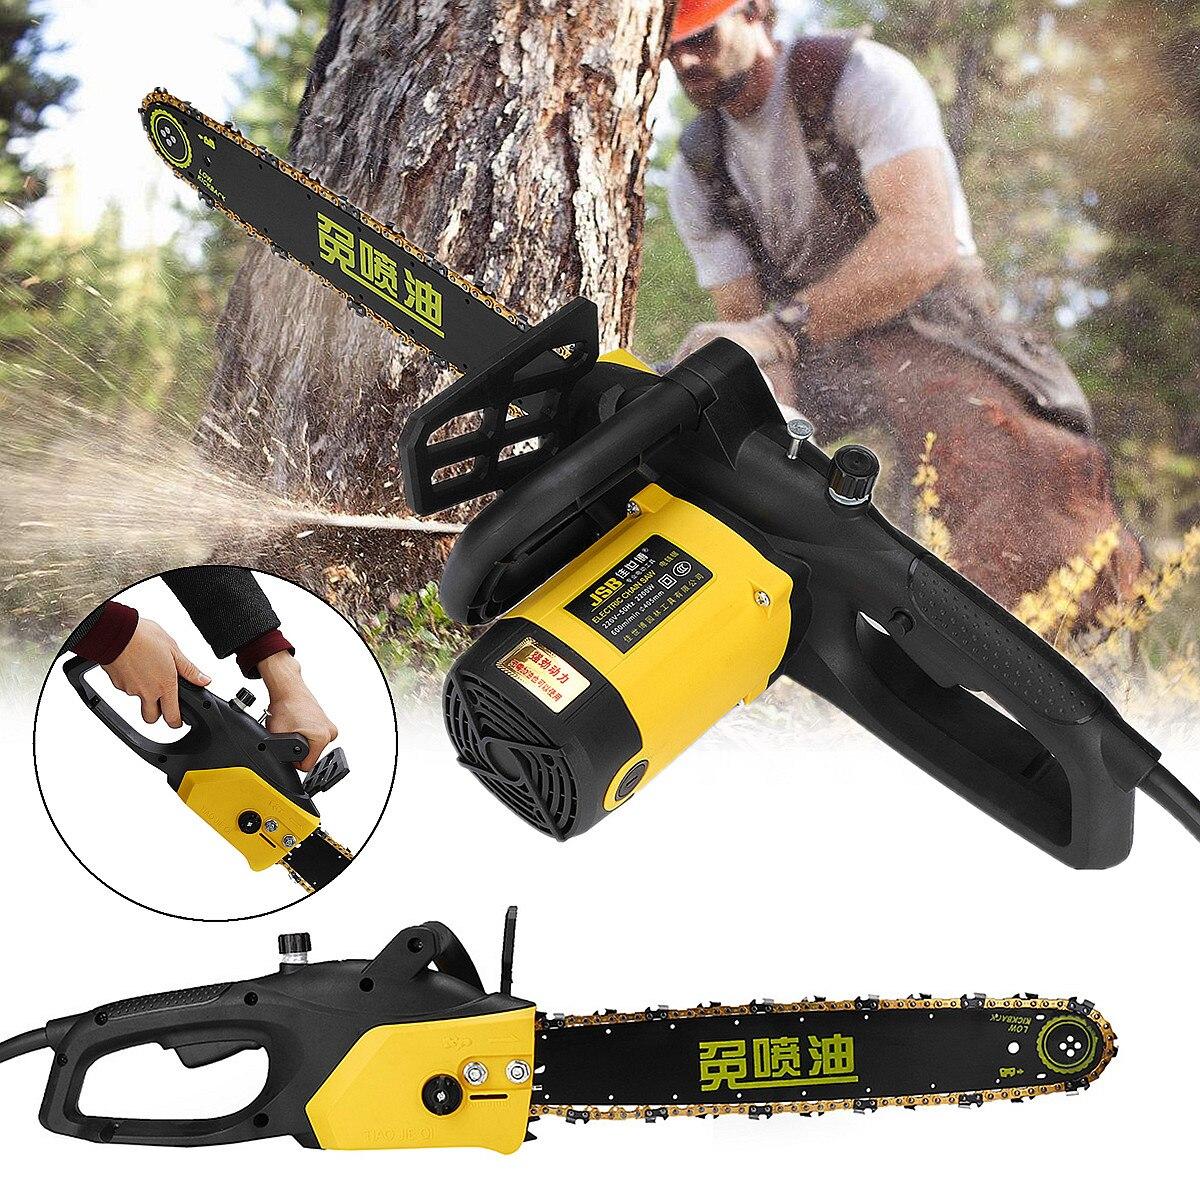 220V 2200W Portable Heavy Duty Electric Chainsaw 50Hz 600r/min Logging Garden Cutting Saw Tool Guide Plat 405mm Efficient Cut bt151 bt151 600r to 220